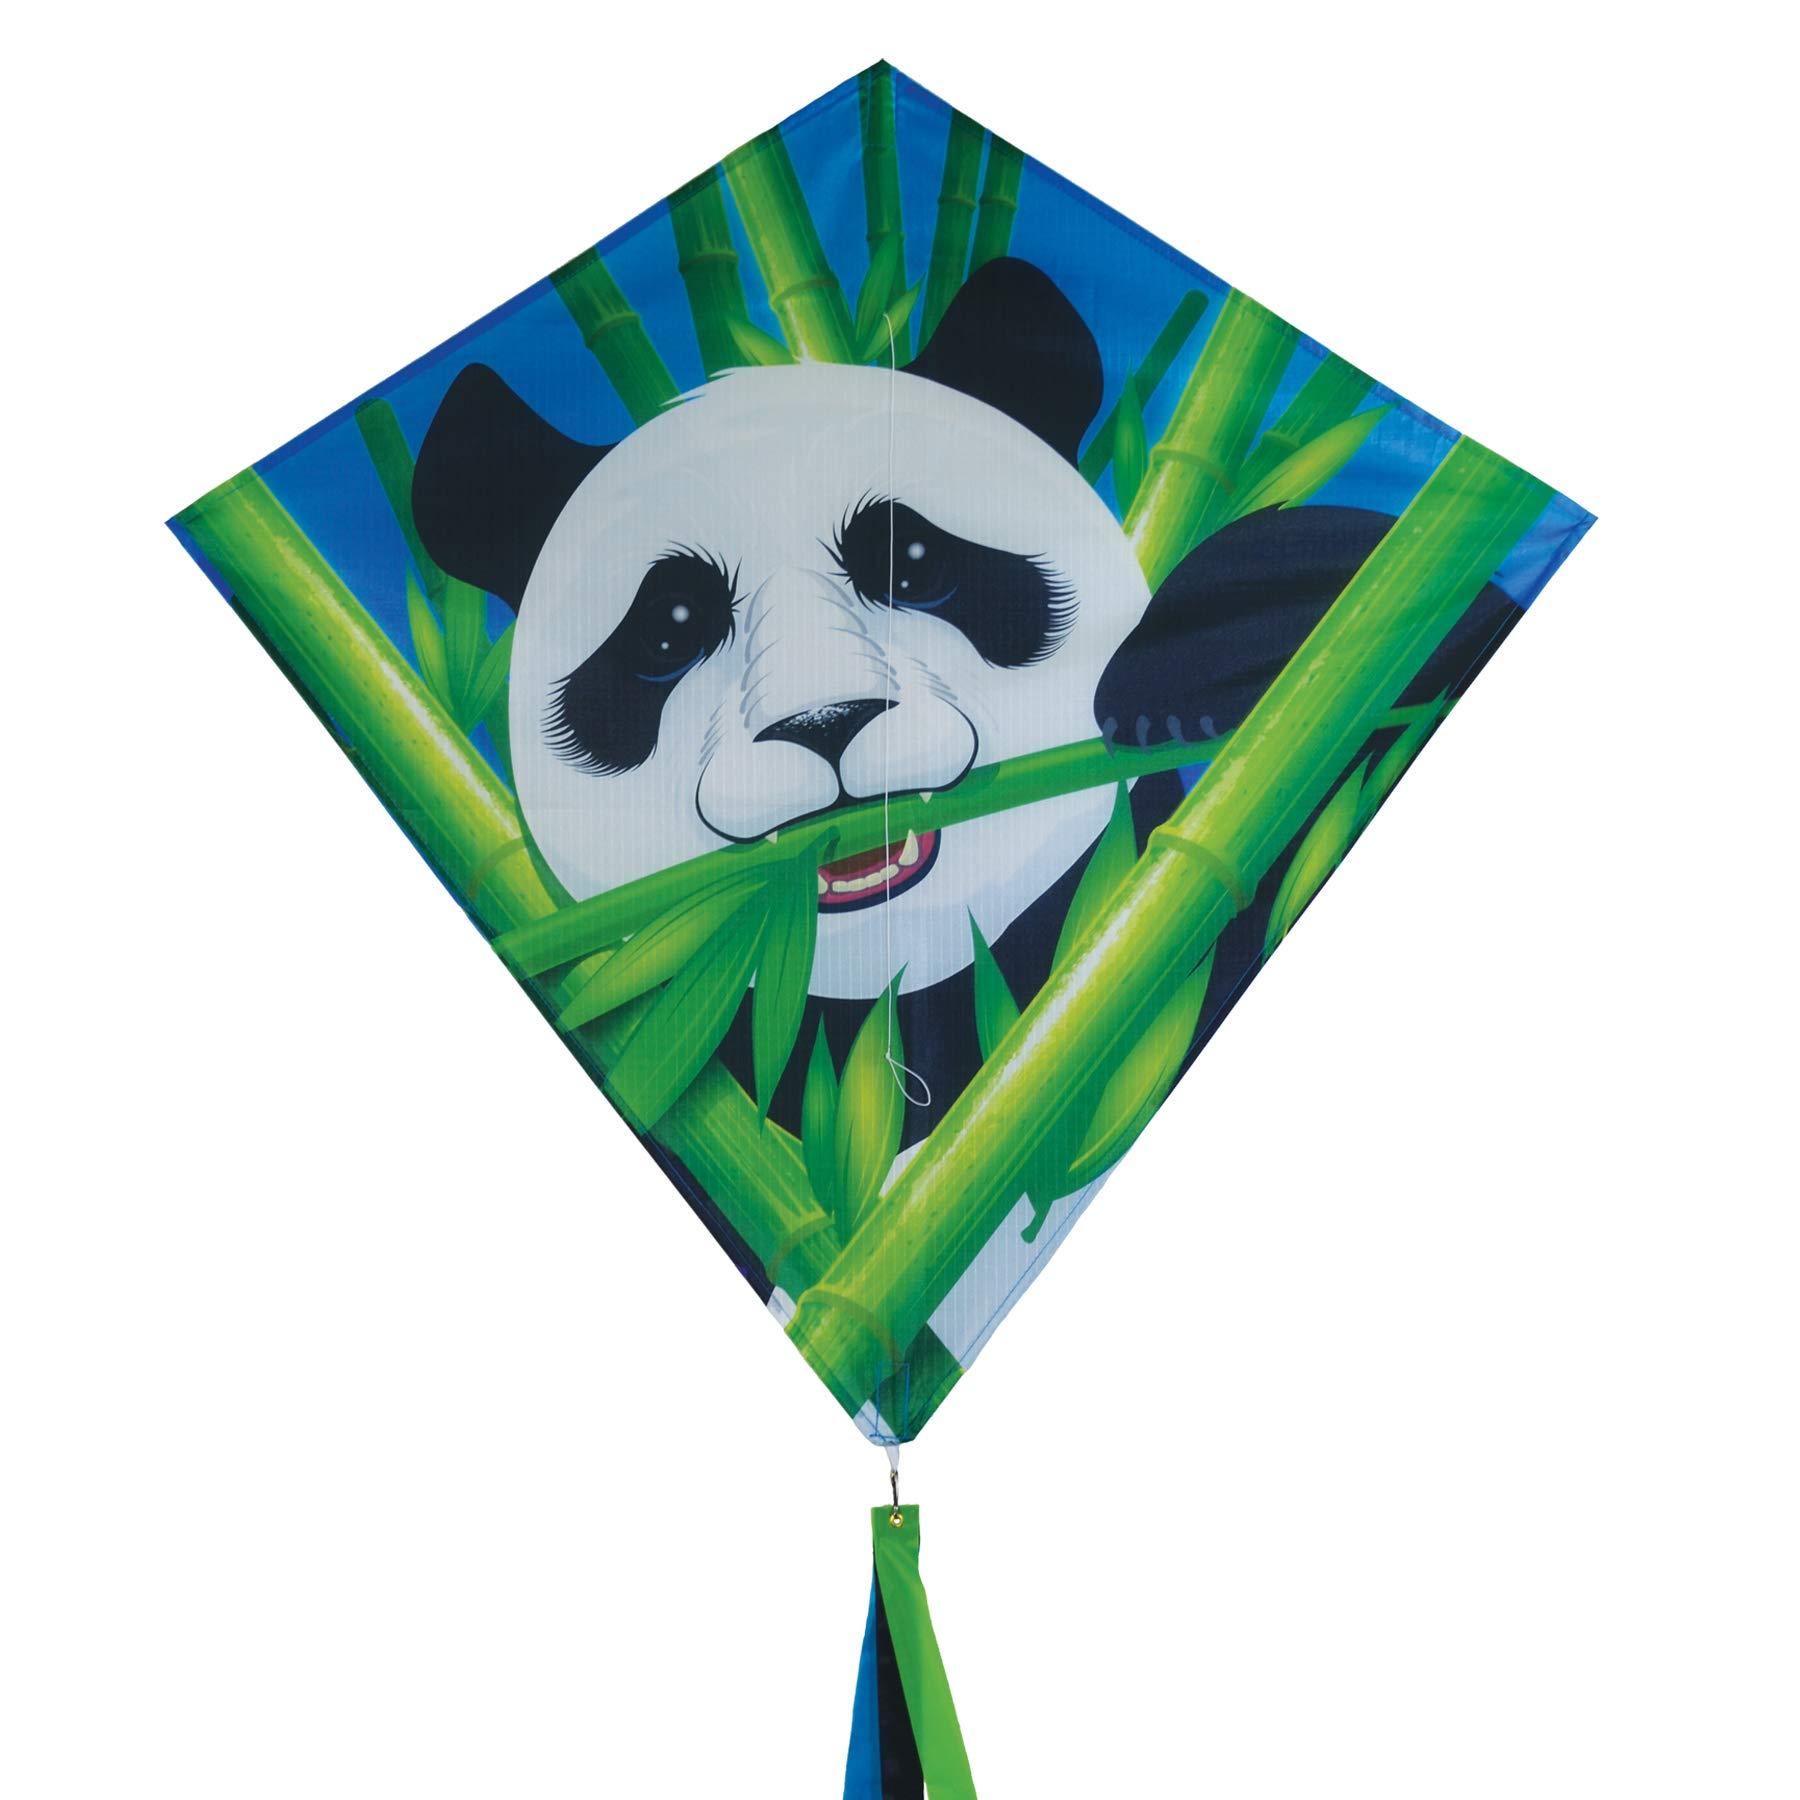 In the Breeze - Panda 30'' Diamond Kite - Fun, Easy Flying Kite by In the Breeze